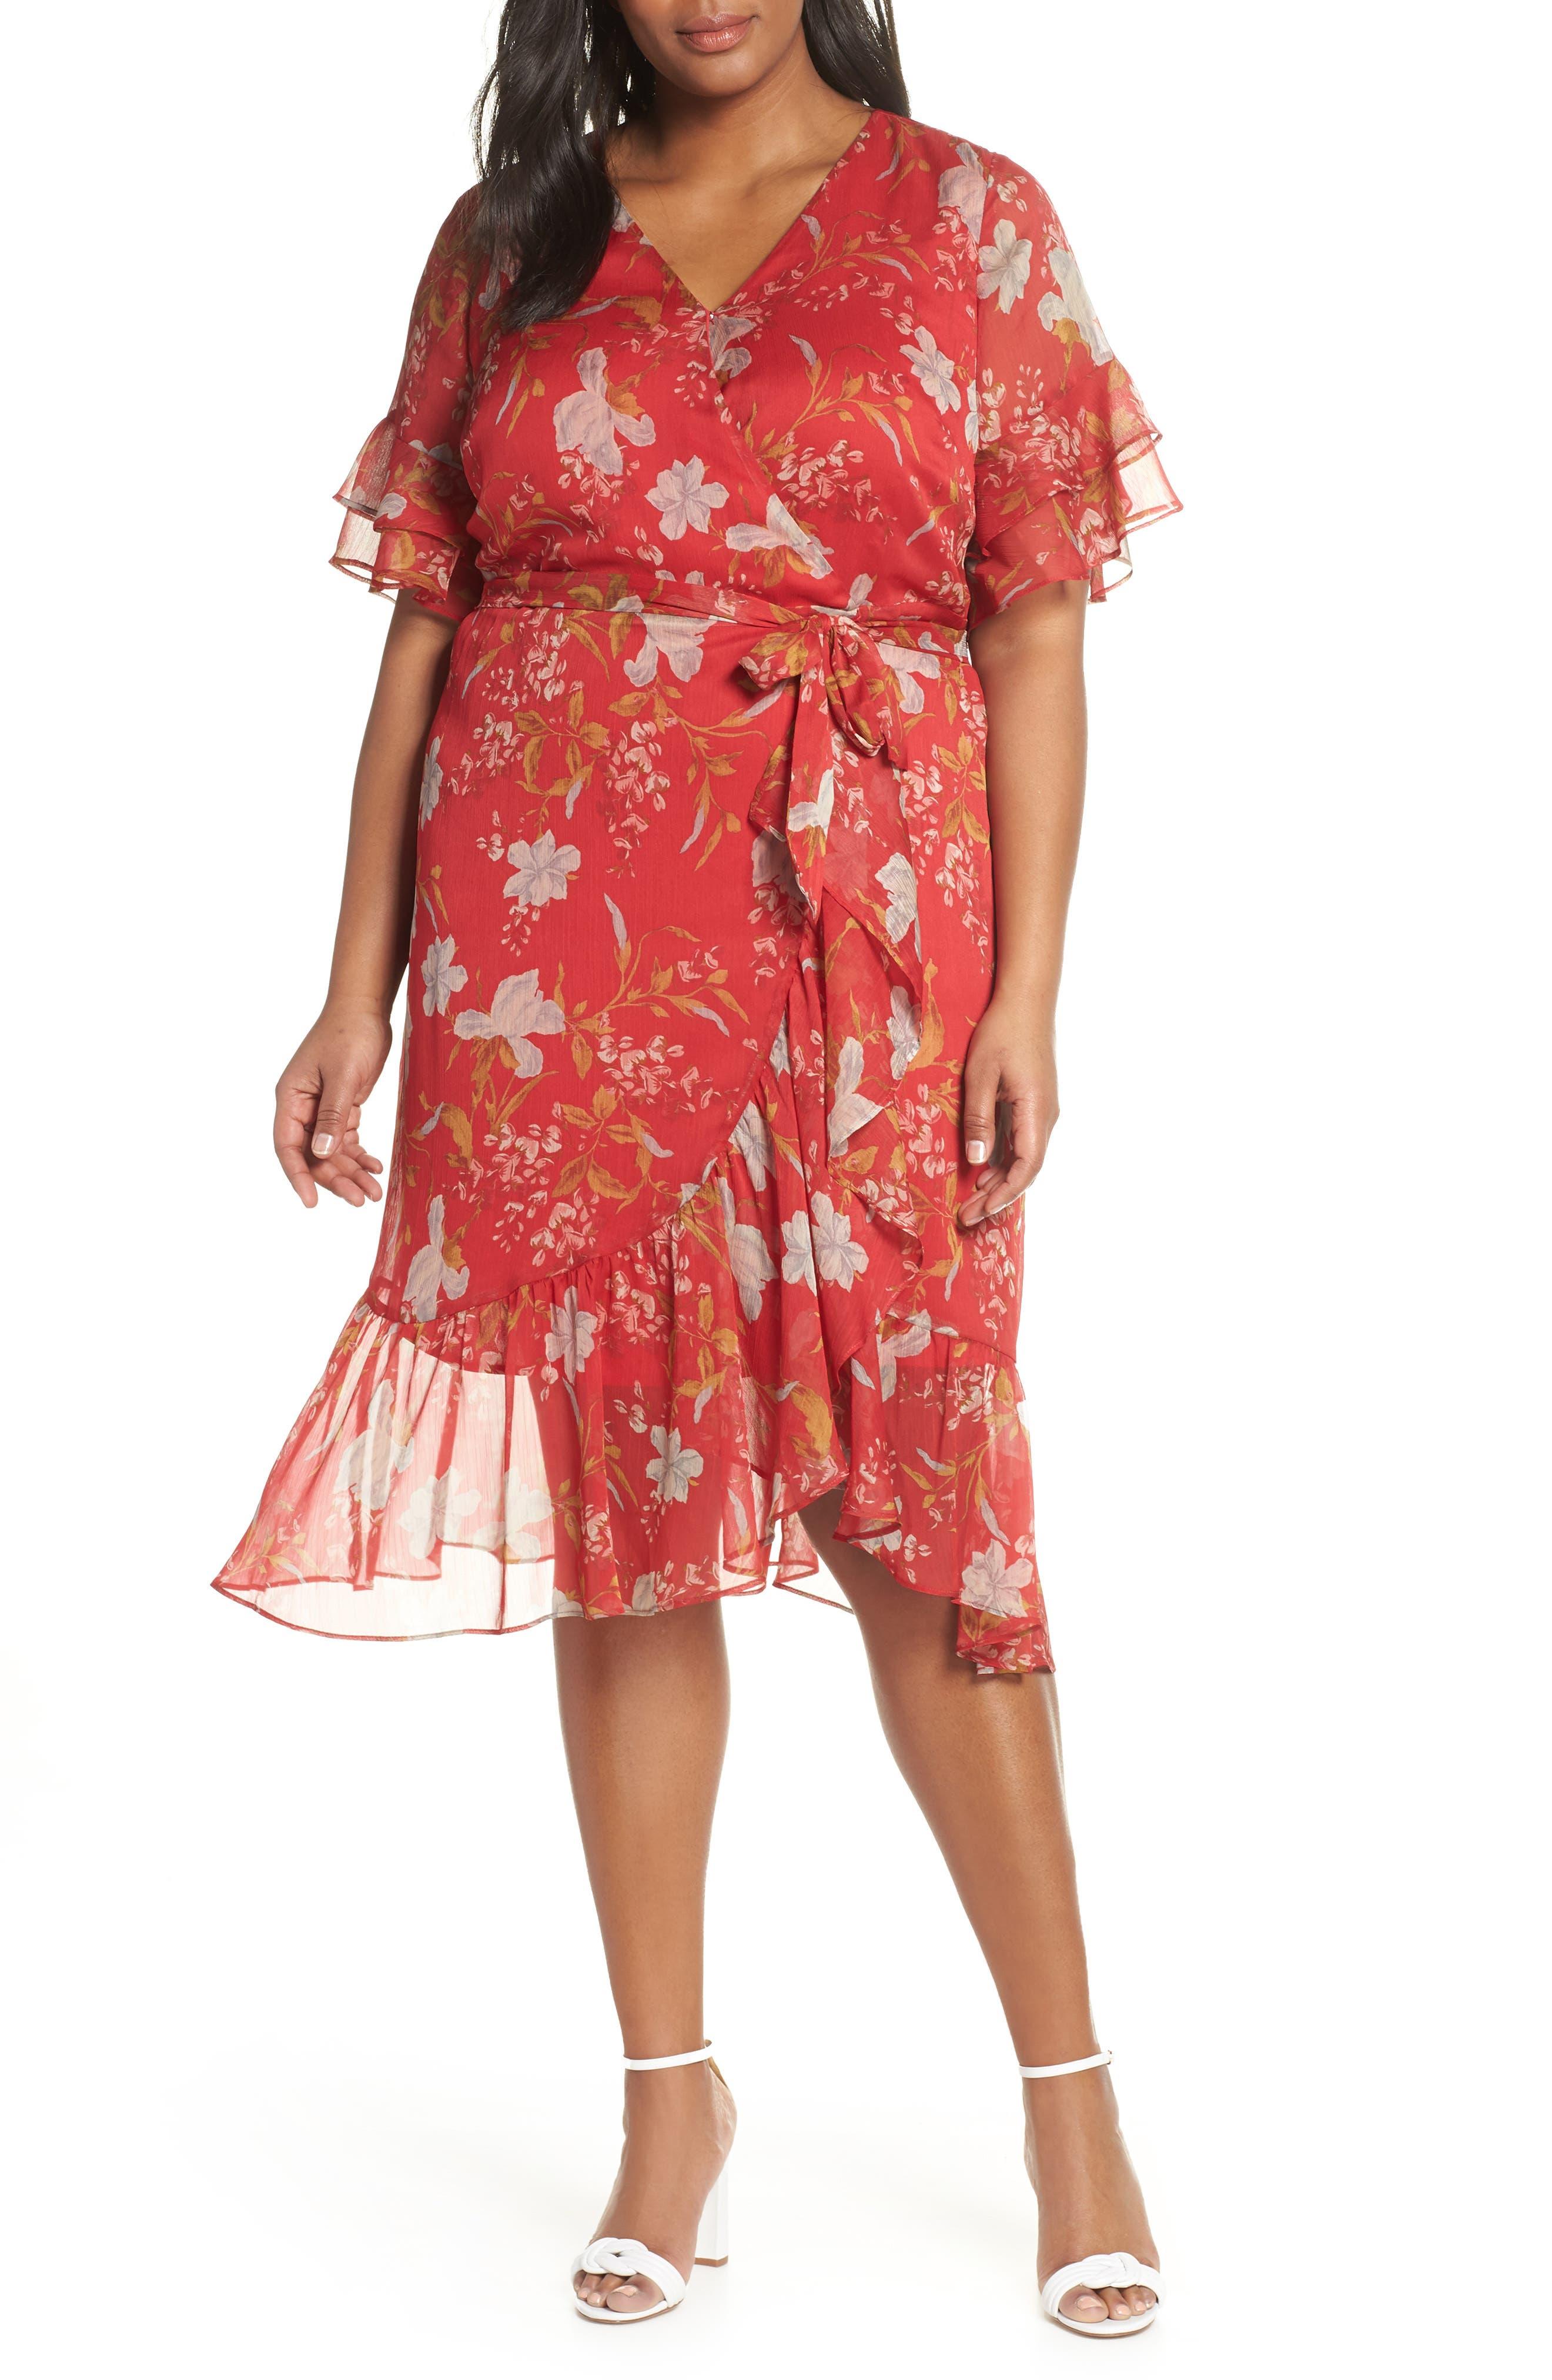 Plus Size Vince Camuto Wildflower Tiered Ruffle Chiffon Dress, Red